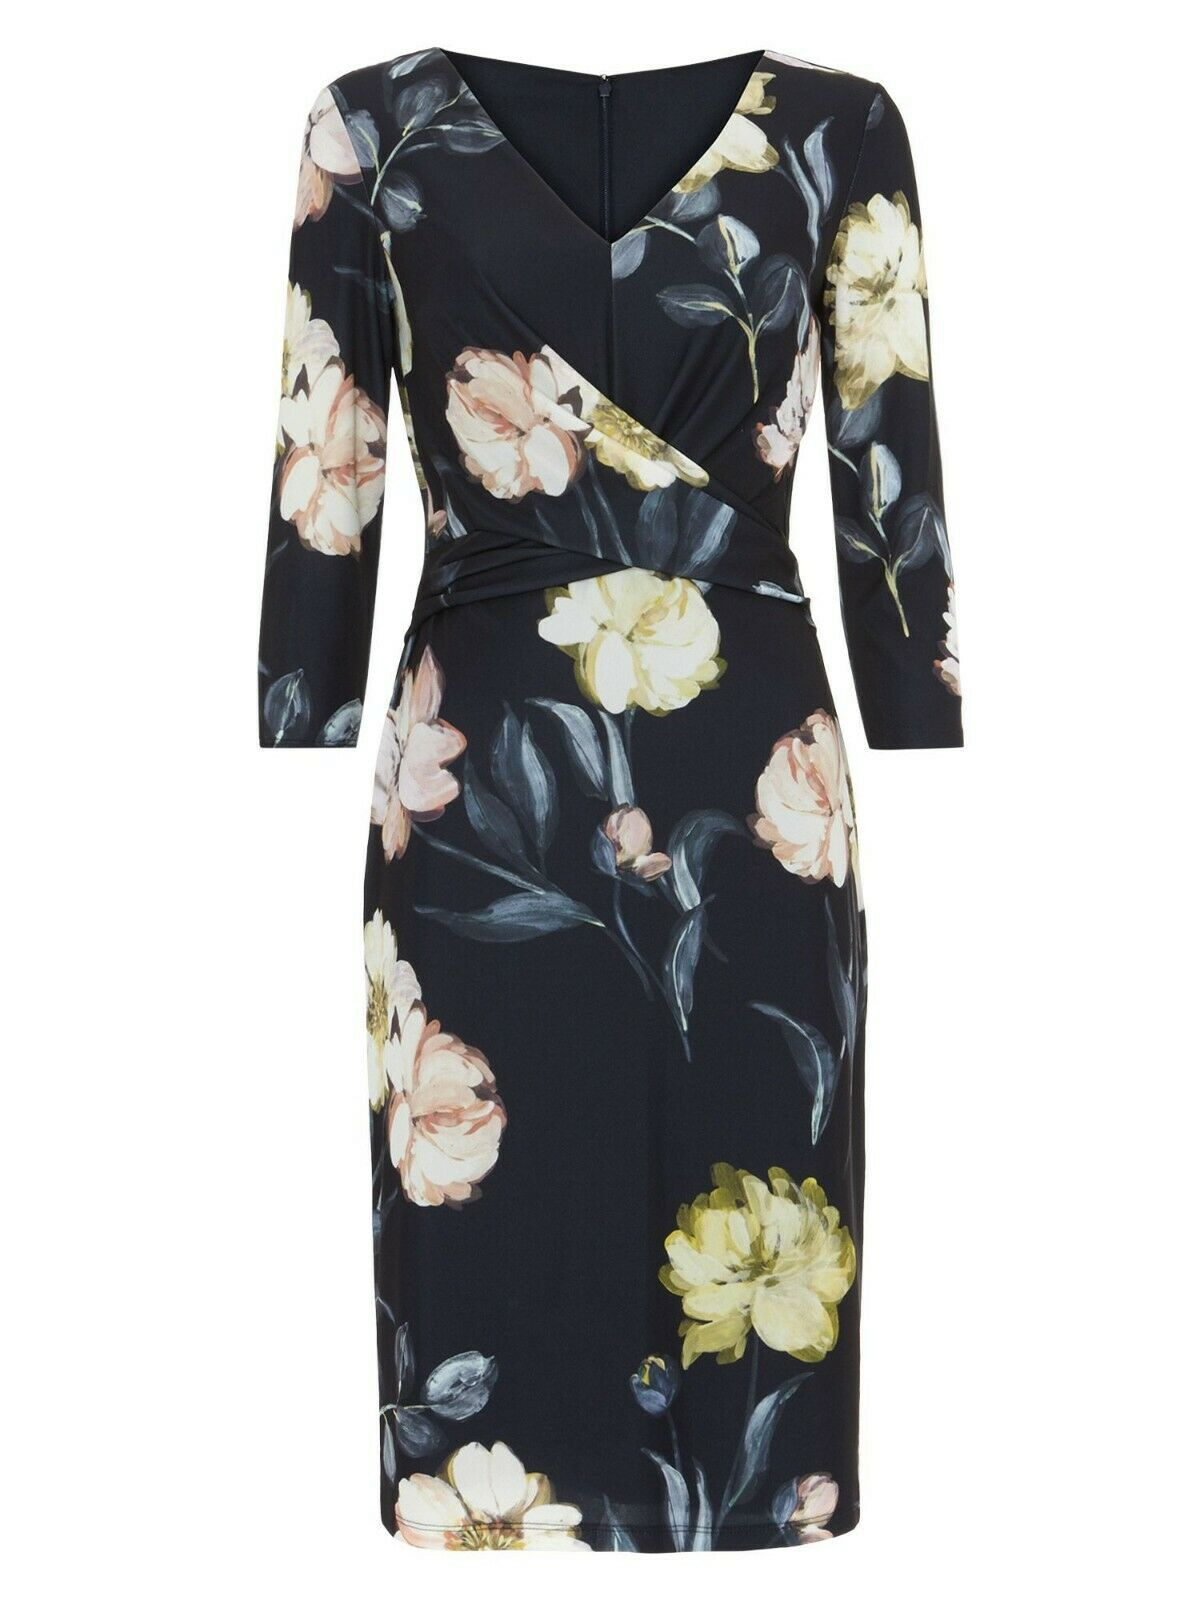 New Phase Eight Marina Navy Floral Dress Sz UK 8 8 8 | Verrückter Preis  | Sorgfältig ausgewählte Materialien  56ef52